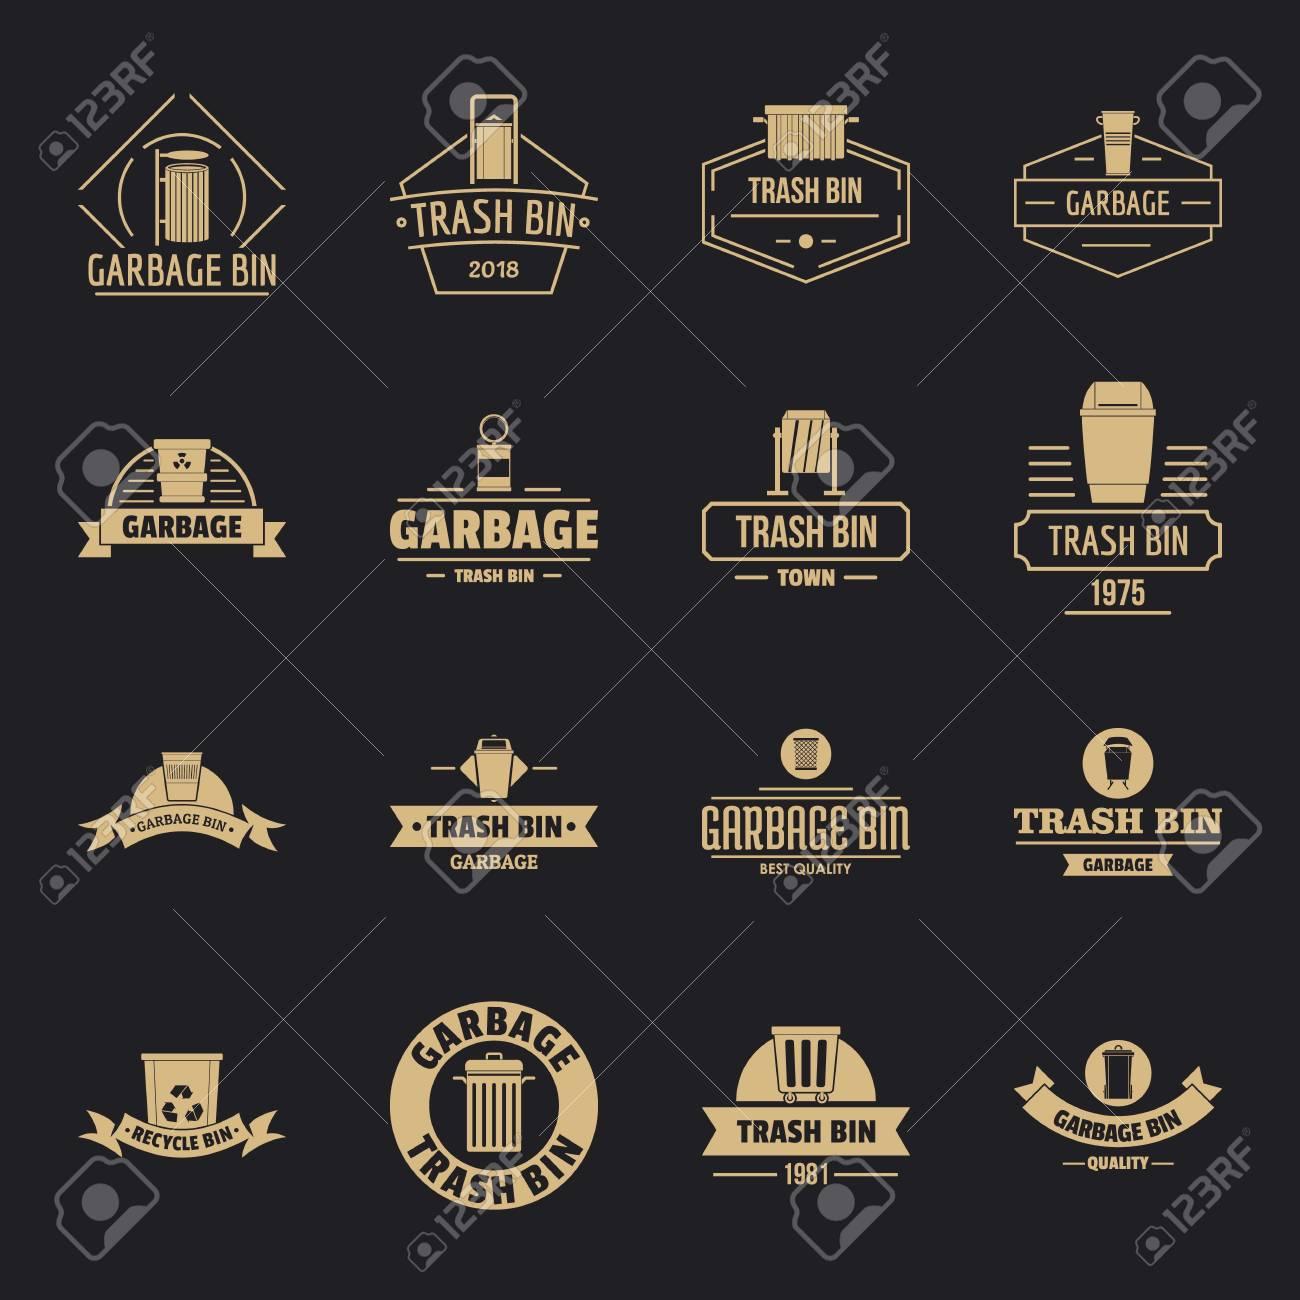 Trash bin icons set, simple style - 114374912